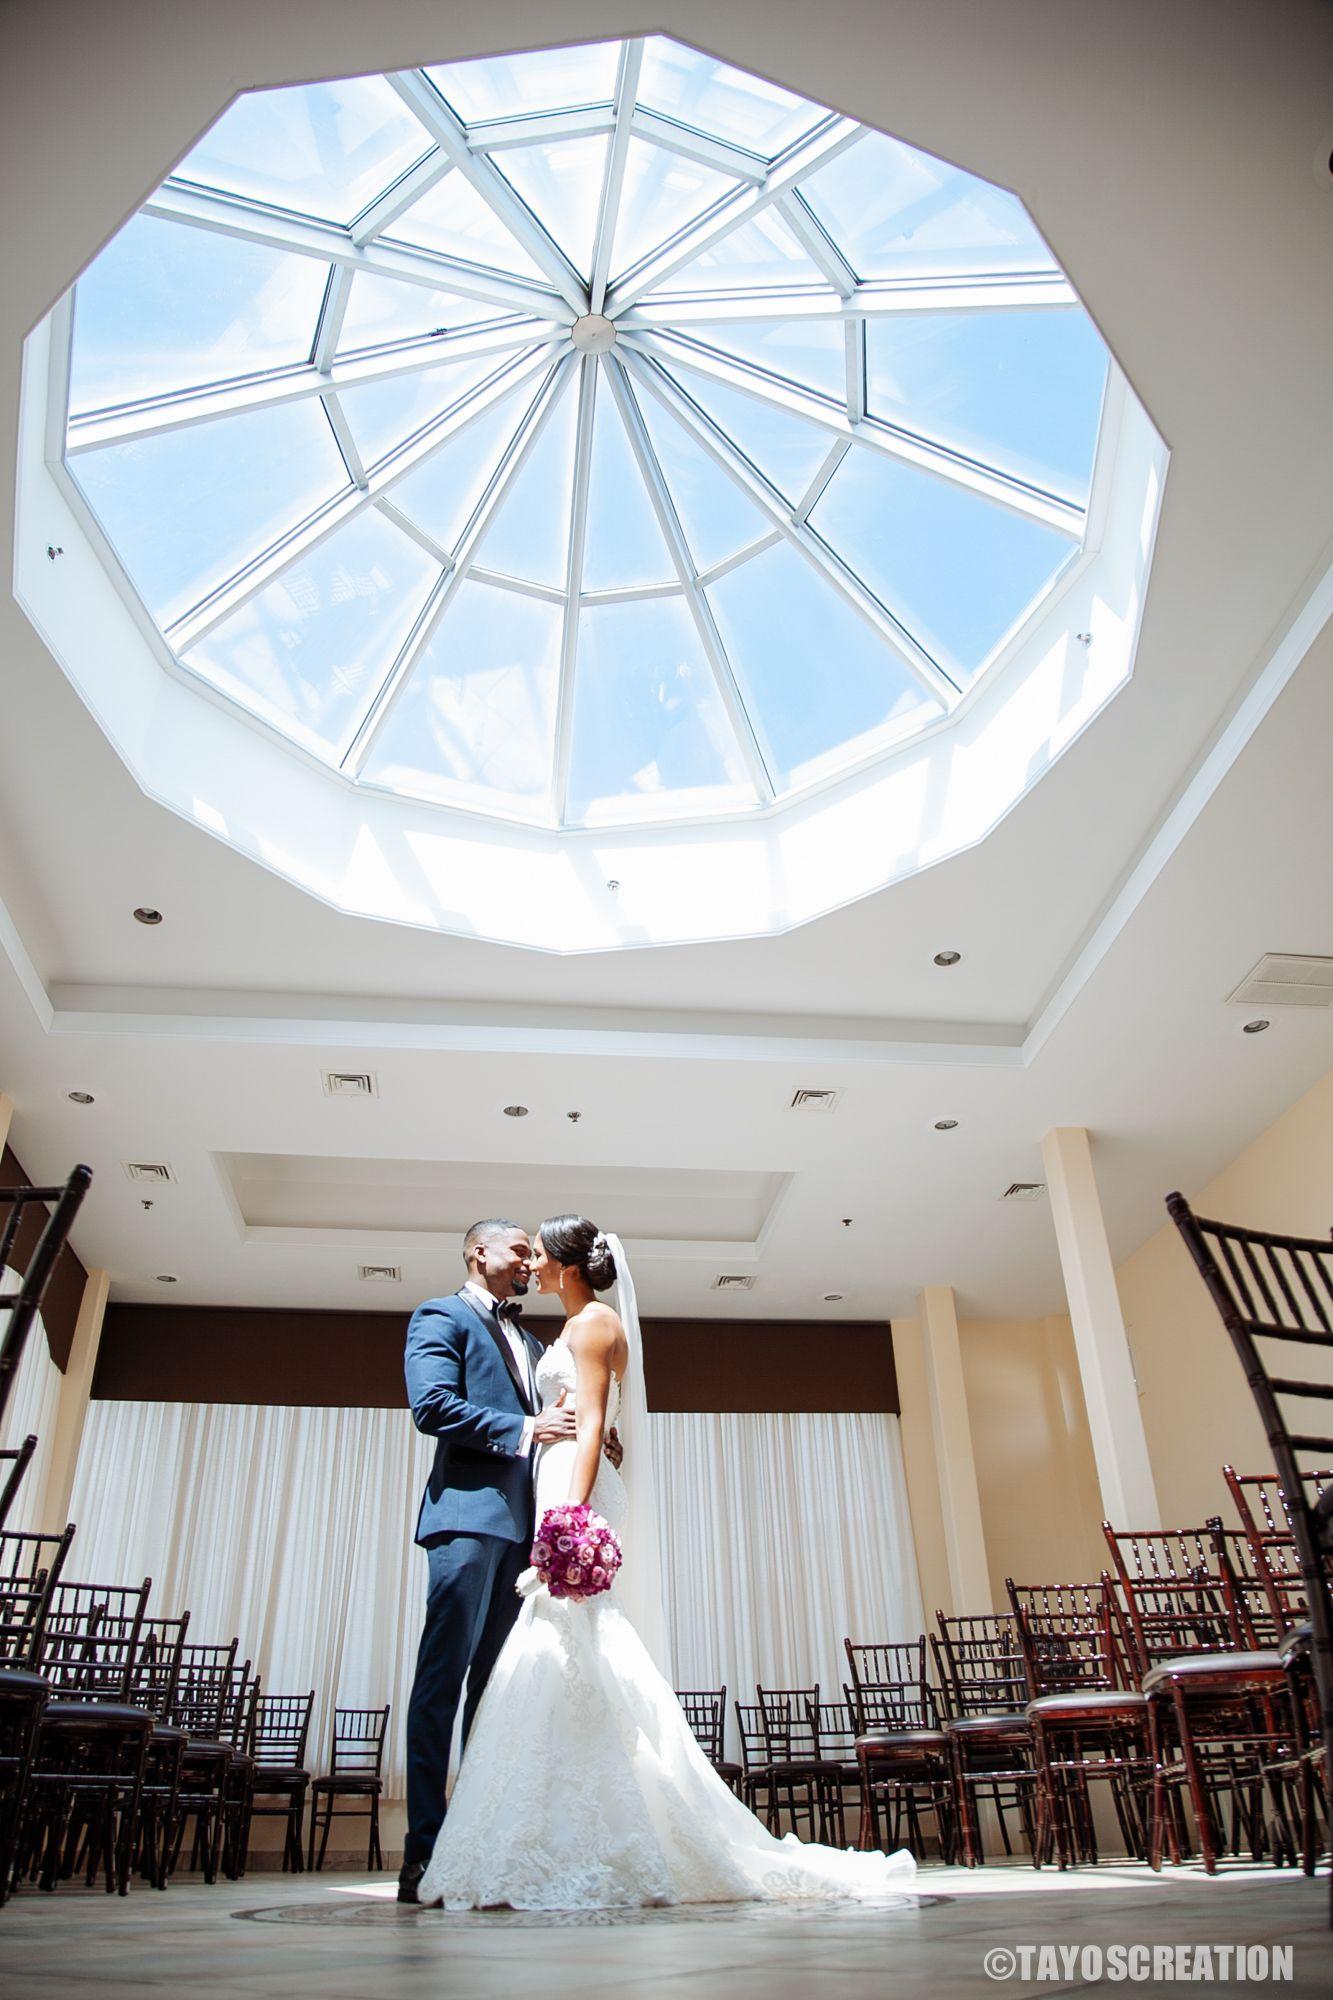 Jan 24 Nondenominational Wedding Ceremony Ideas Wedding